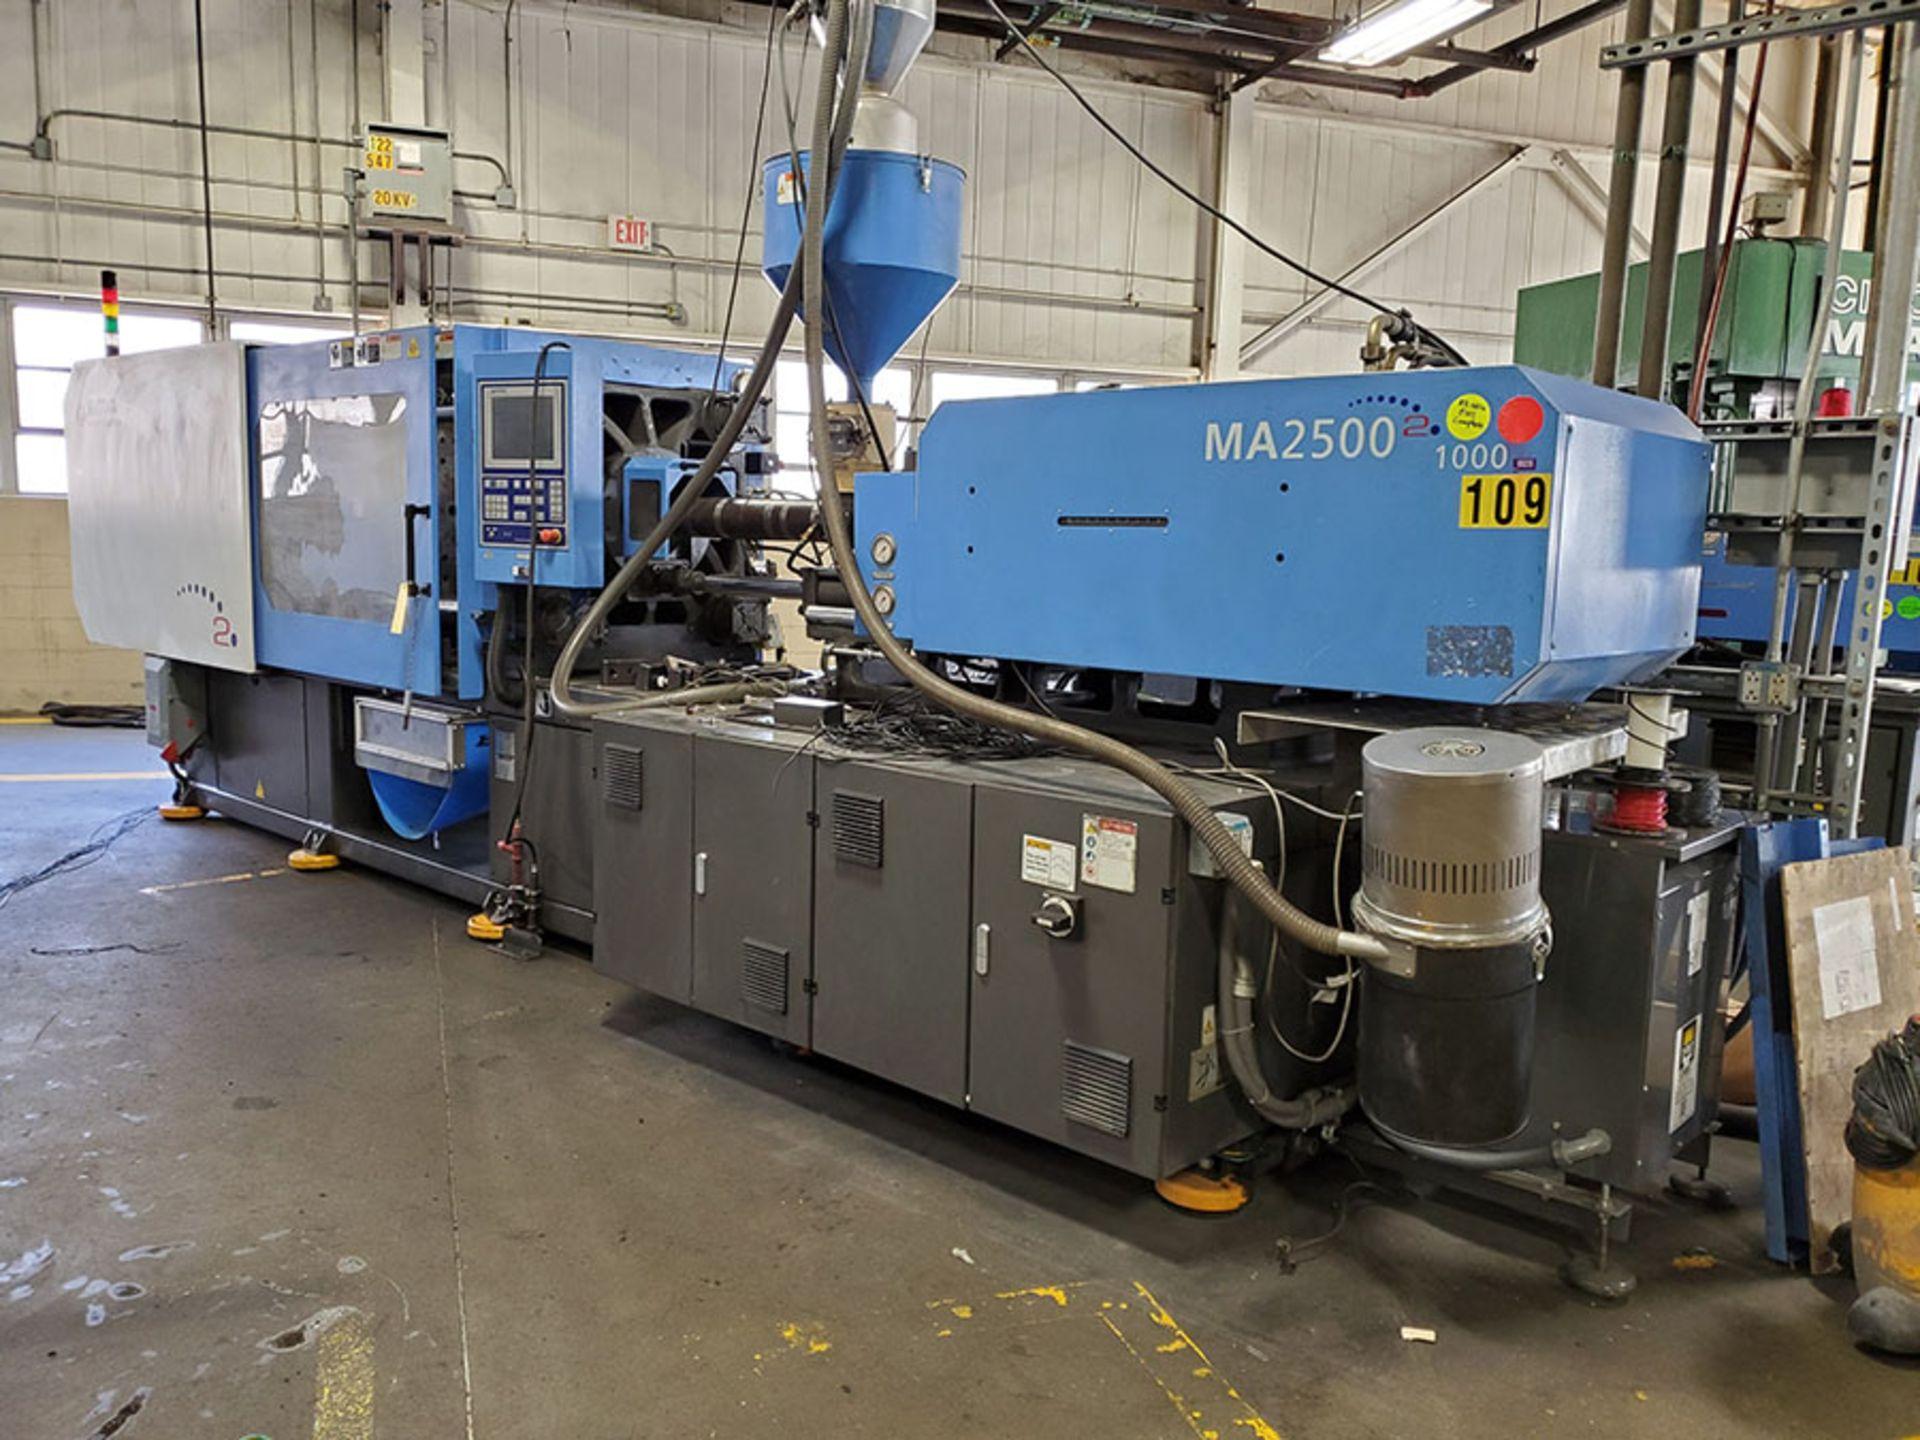 Lot 171 - 2014 HAITIAN 250-TON PLASTIC INJECTION MOLDING MACHINE; MODEL MA2500II, S/N 2014070250, WITH SHINI